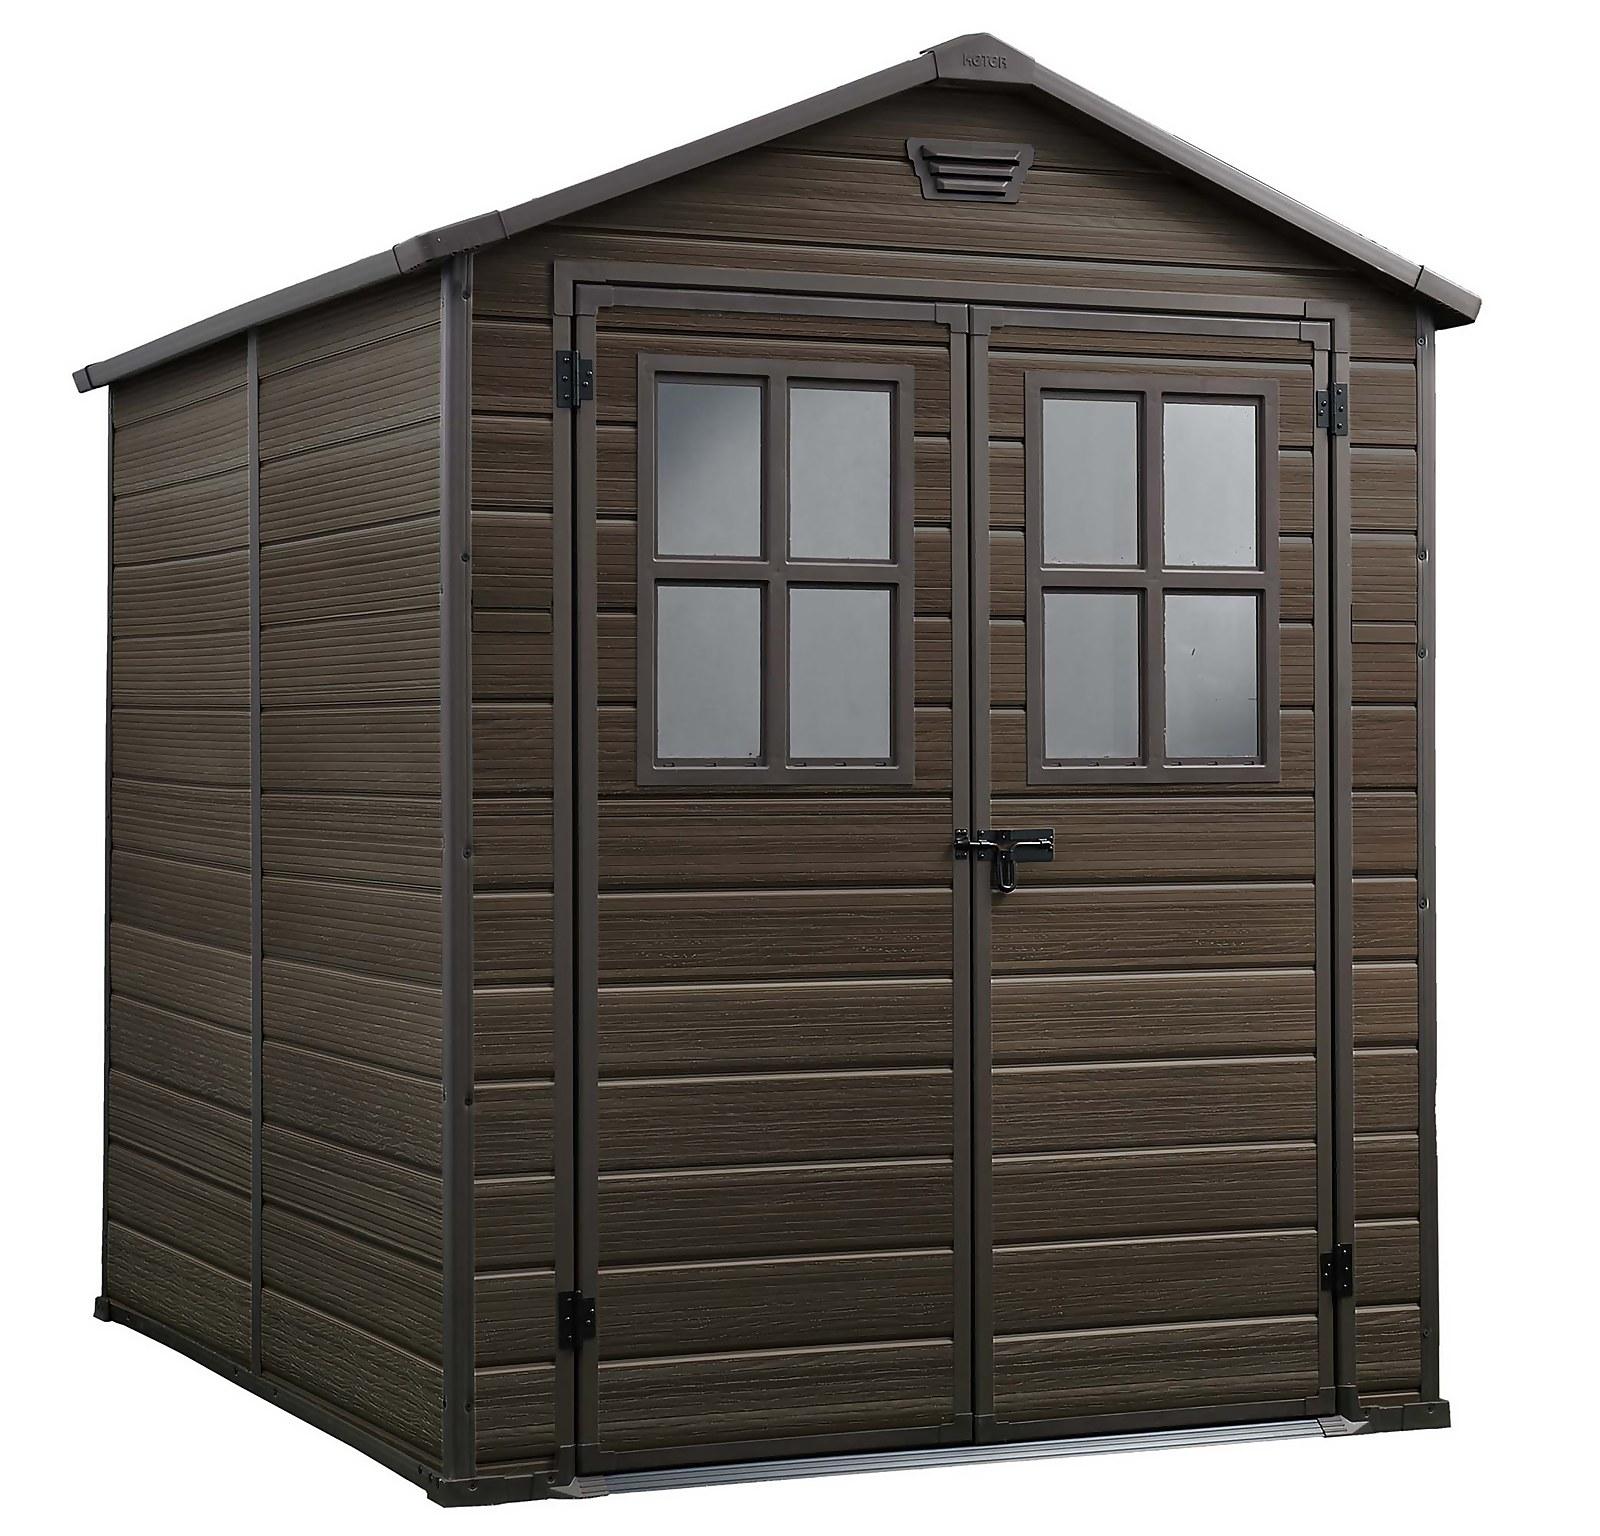 Keter Scala 6 x 8ft Outdoor Garden Apex Storage Shed - Brown